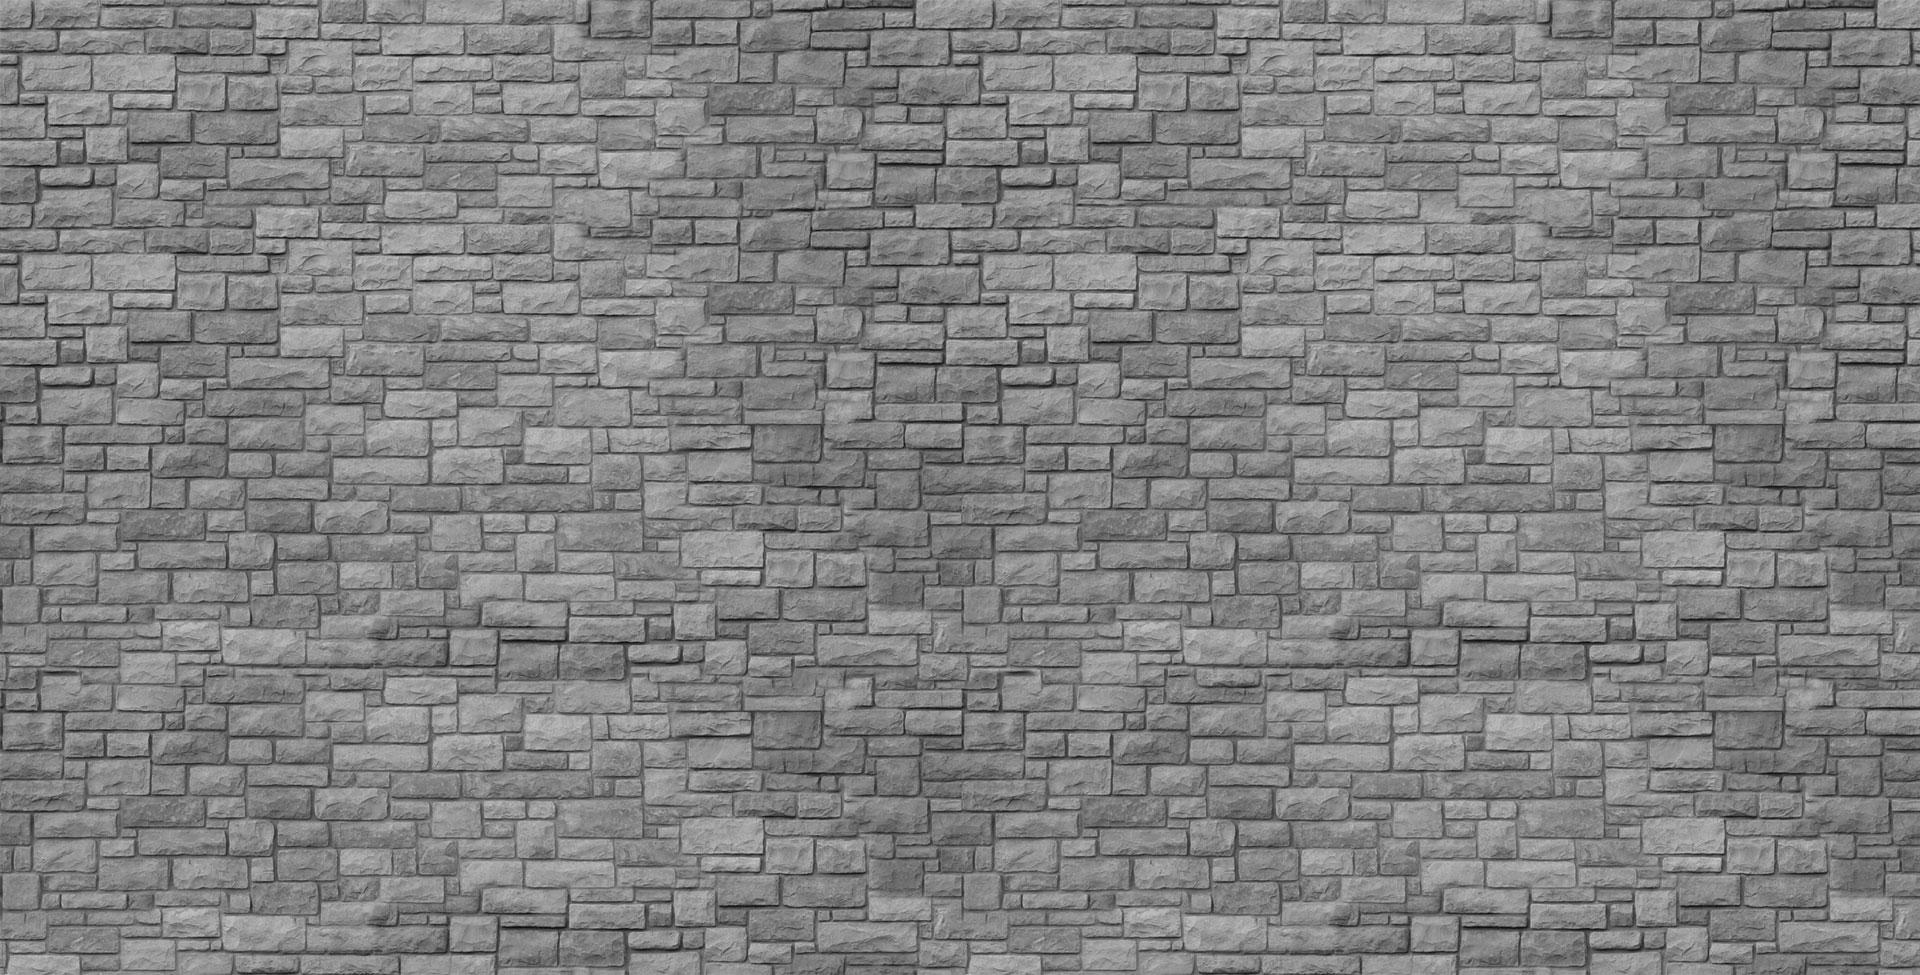 Stone Wall Texture Wallpaper 2